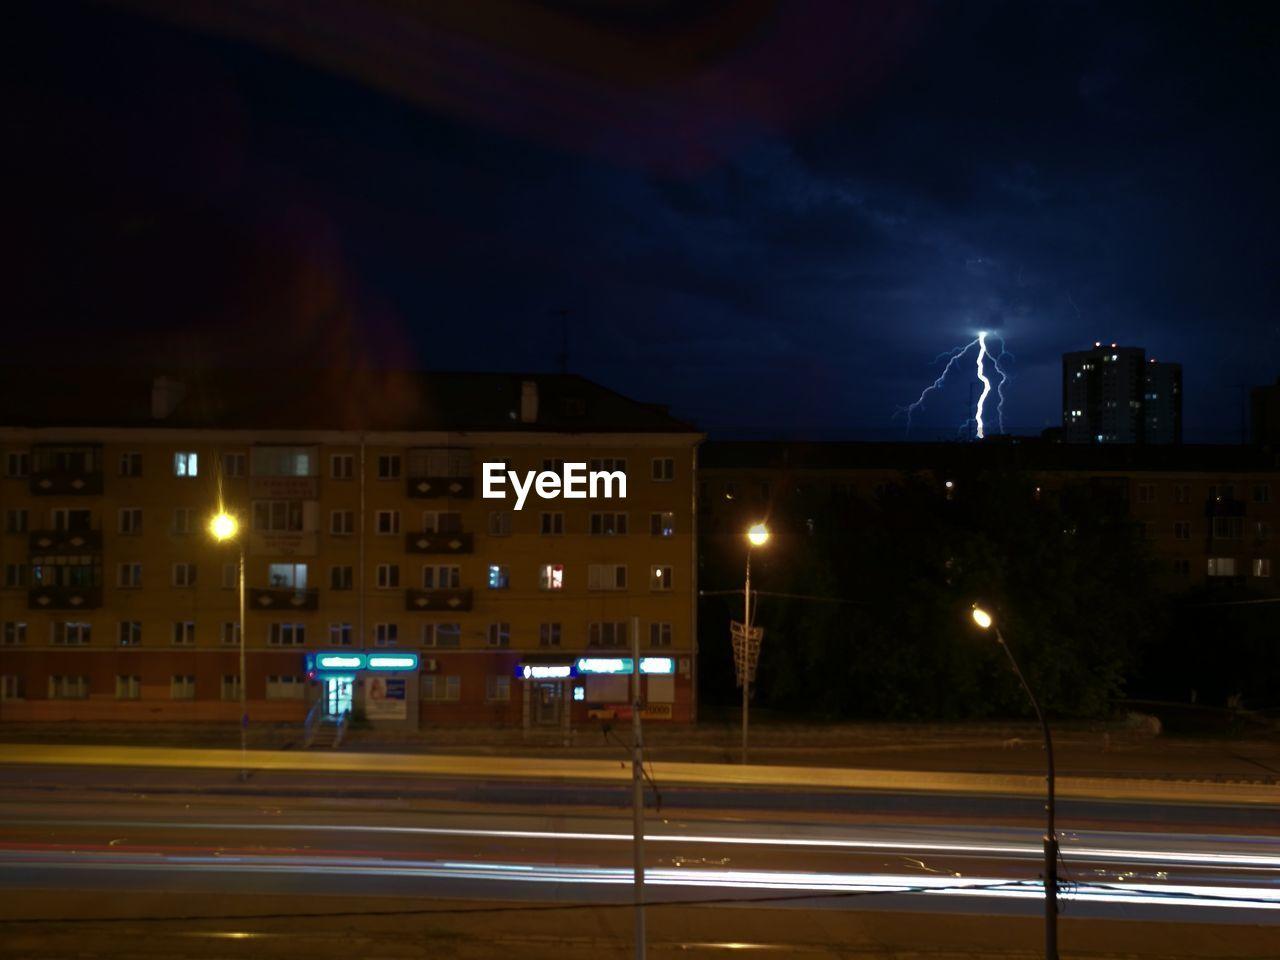 night, illuminated, building exterior, architecture, built structure, street light, outdoors, sky, city, no people, lightning, thunderstorm